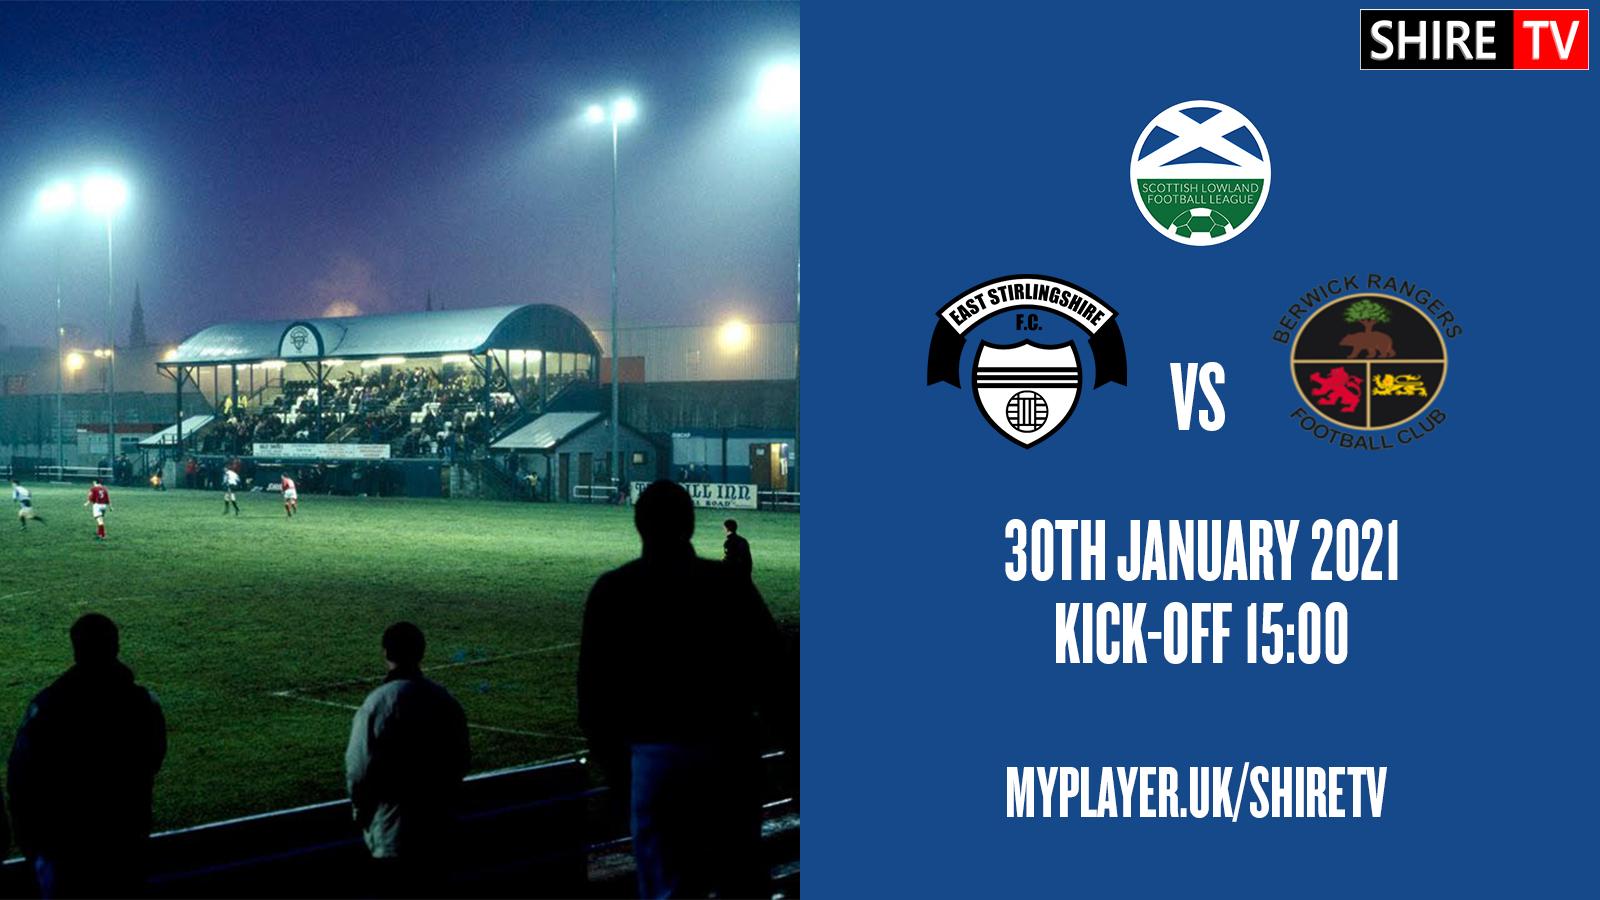 East Stirlingshire V Berwick Rangers (30th January 2021)